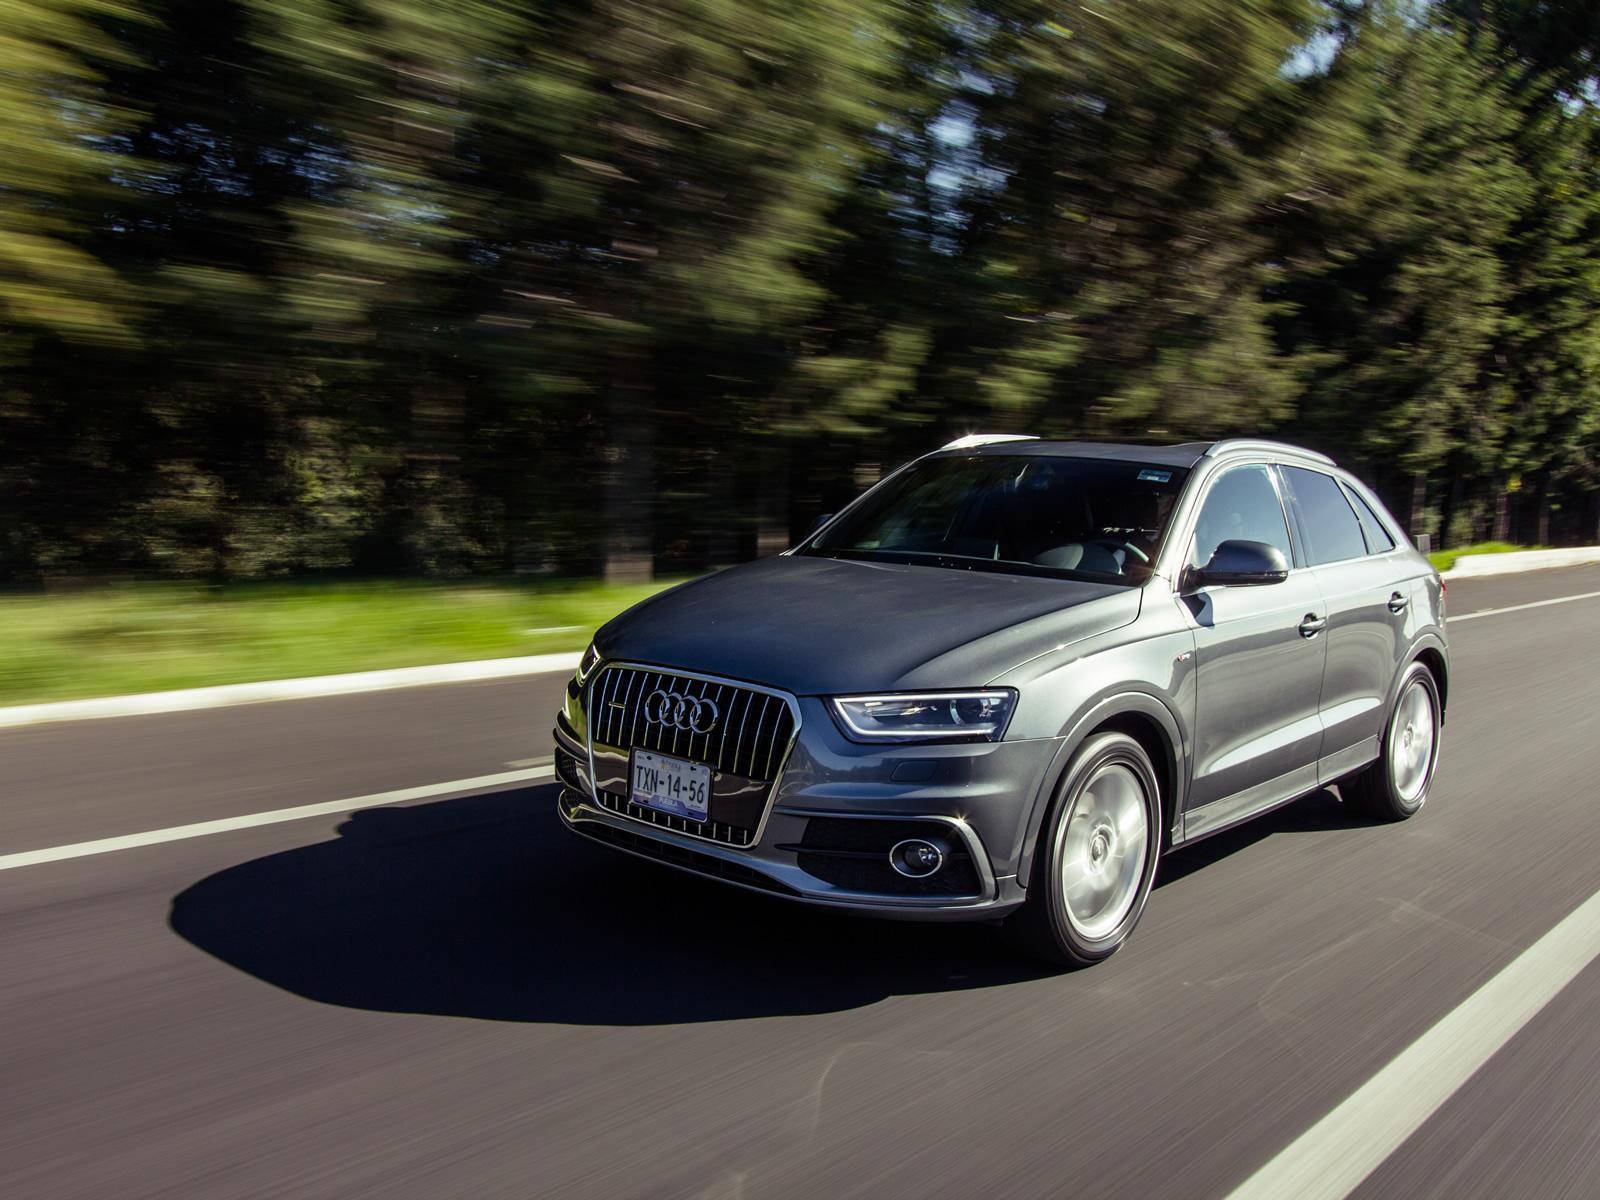 Probamos el nuevo Audi Q3 2.0 TFSi de 211 CV